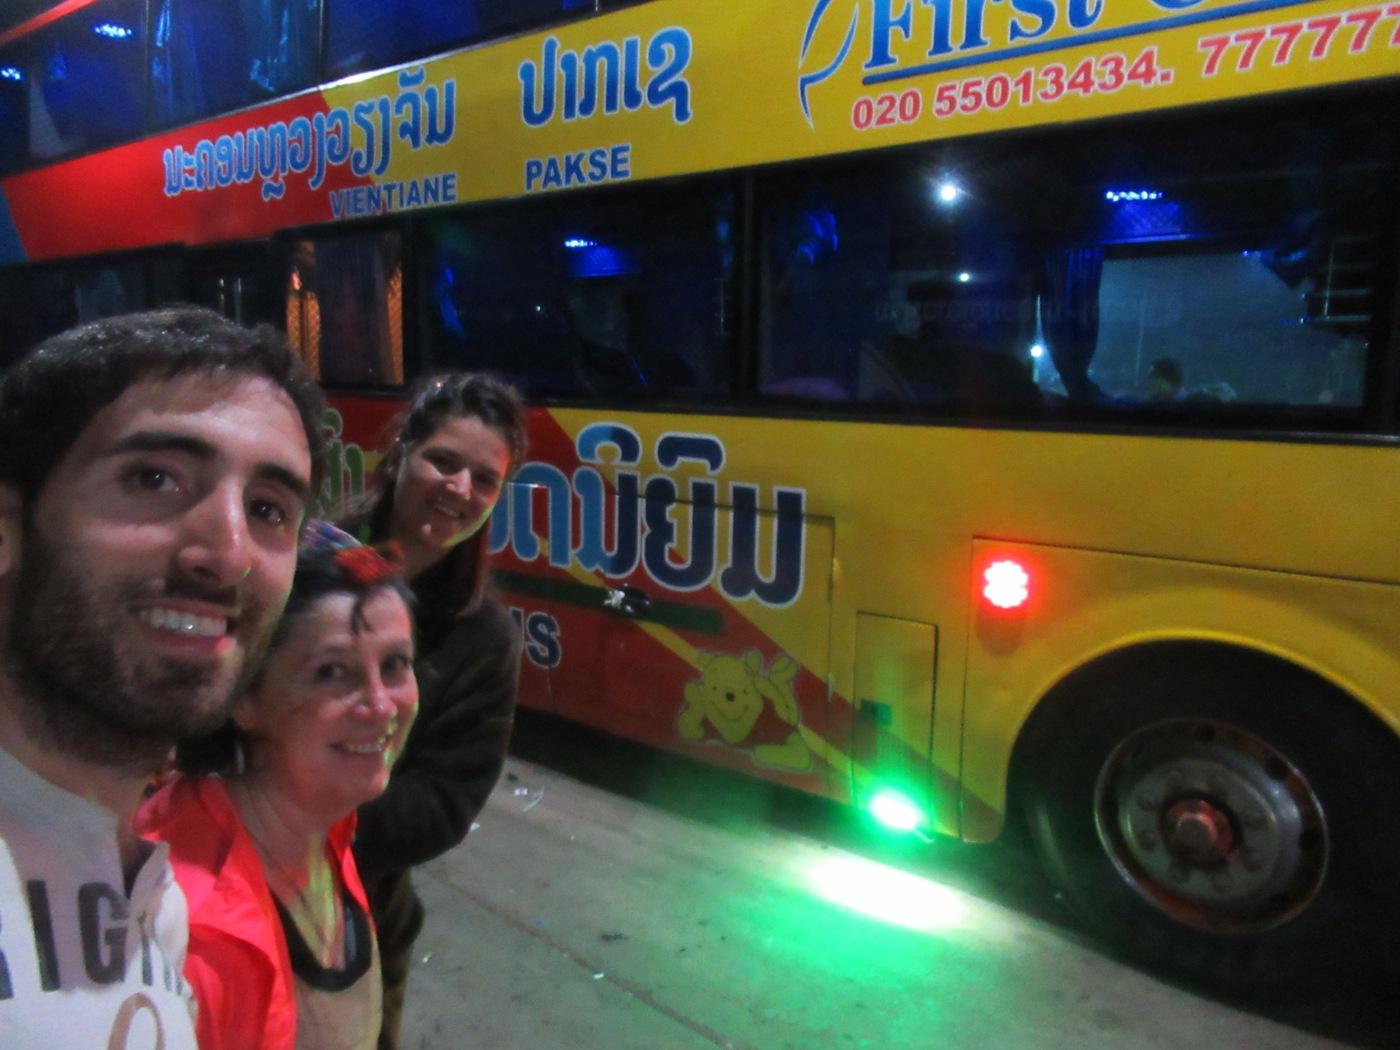 2019-12-laos-vientian-thakhek-bus-nocturno-1